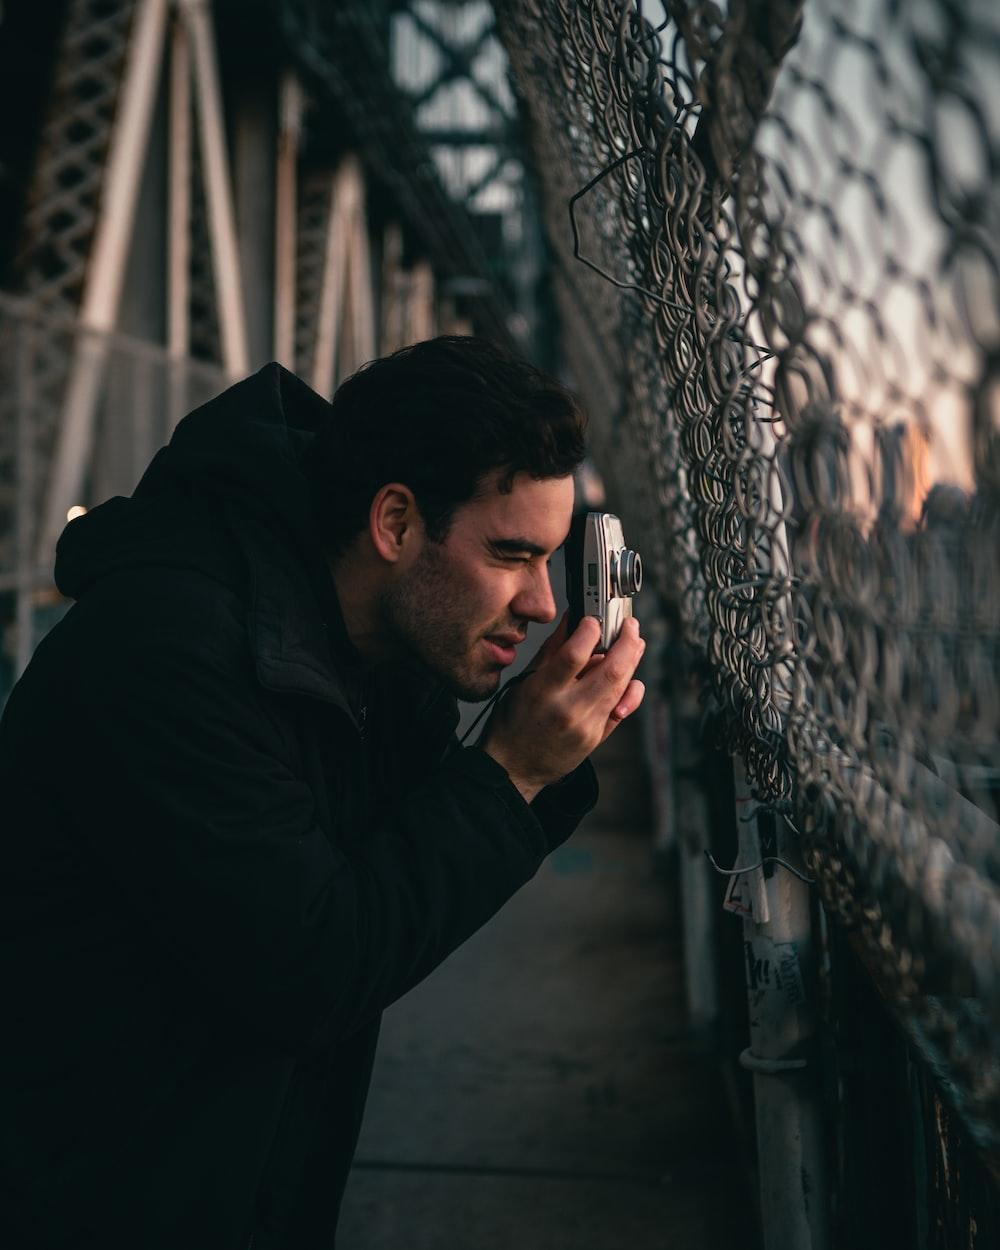 man in black jacket holding smartphone